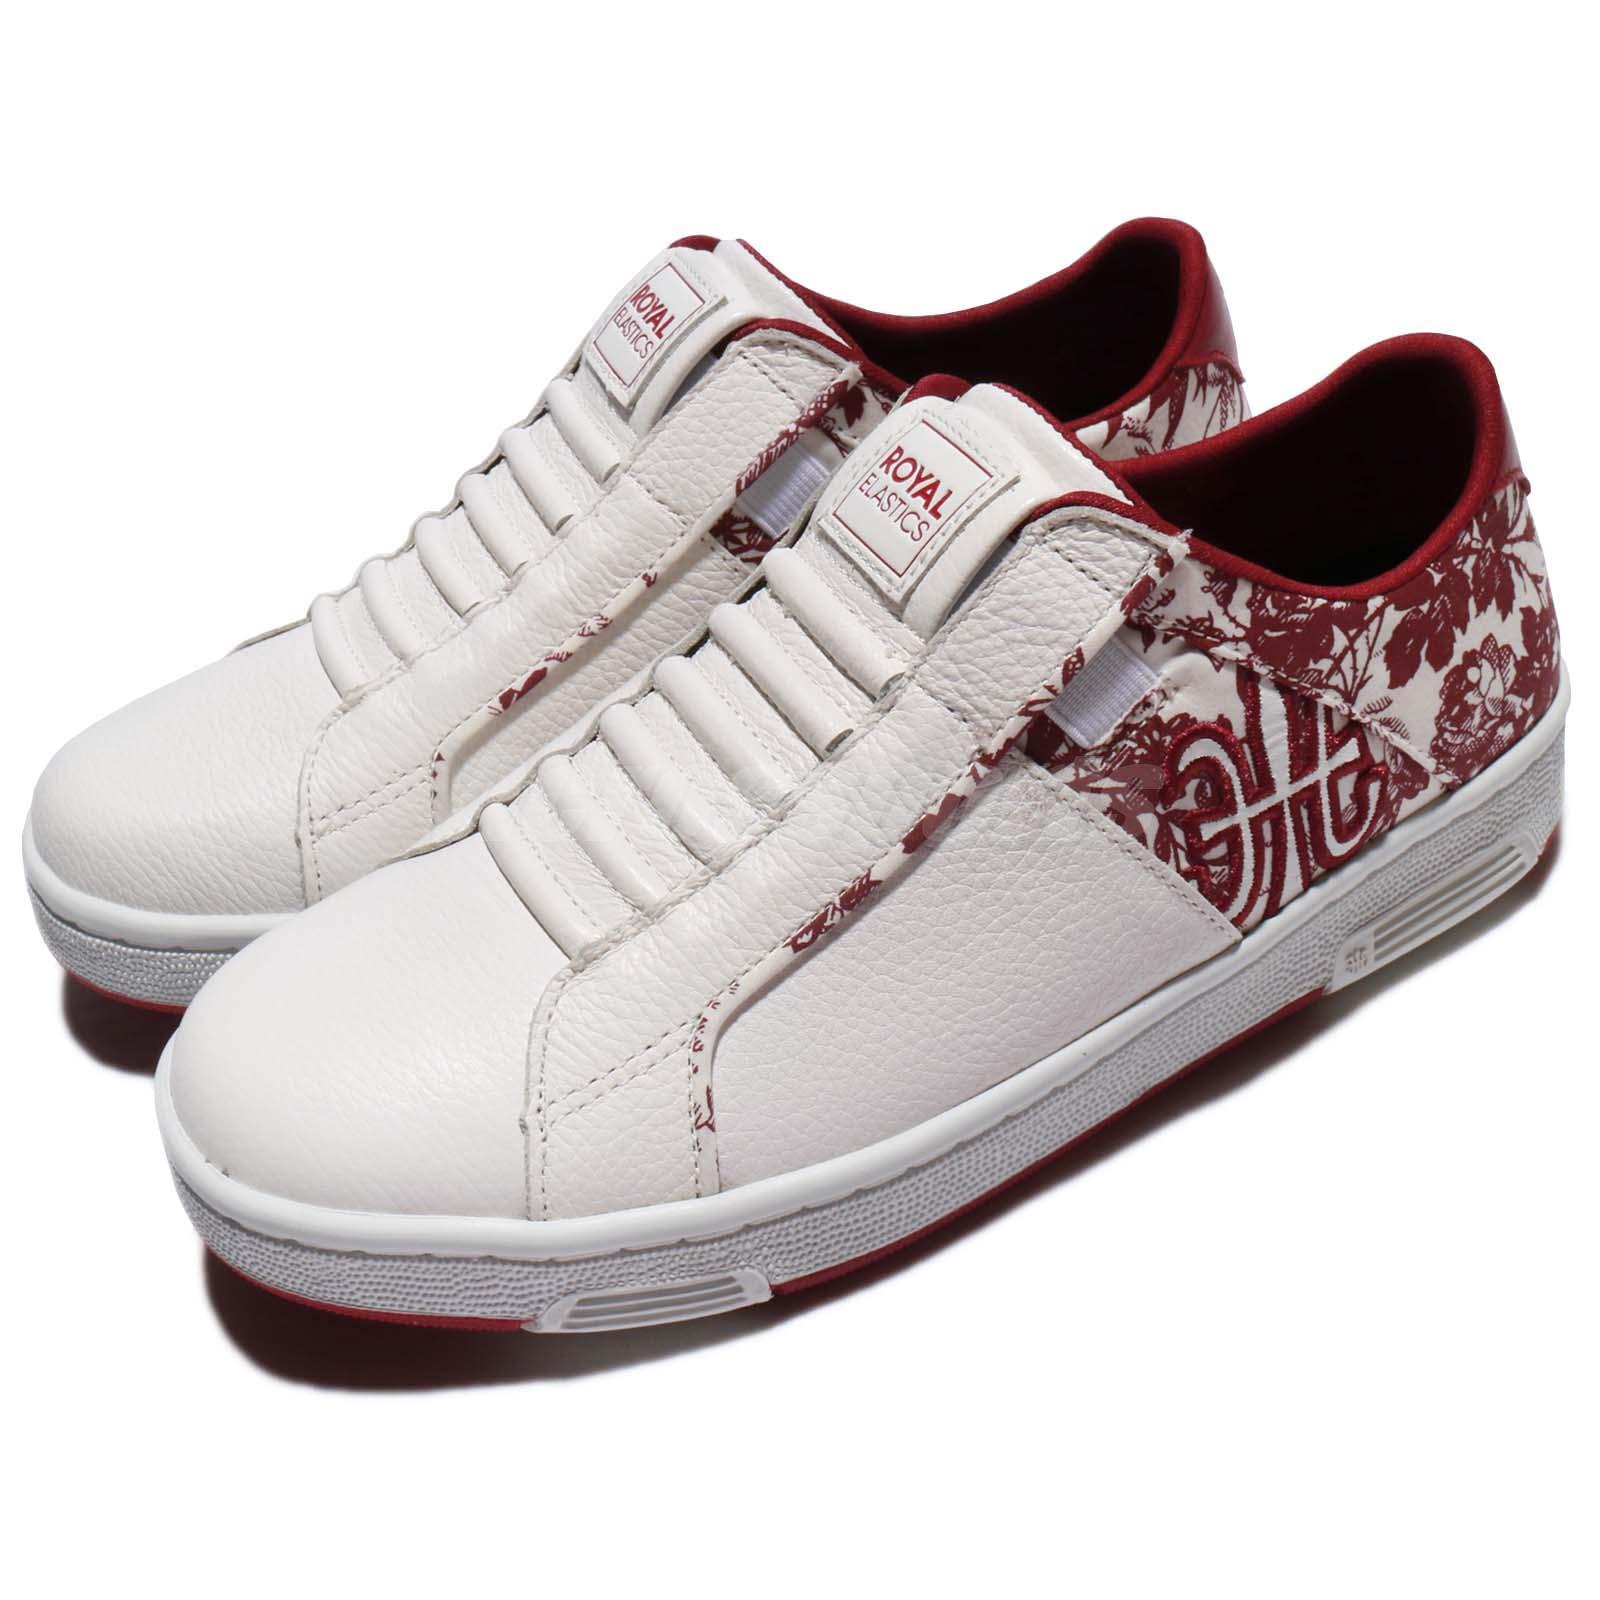 Royal Elastics Icon Z 1801 Floral White Red Women Shoe Sneakers ...